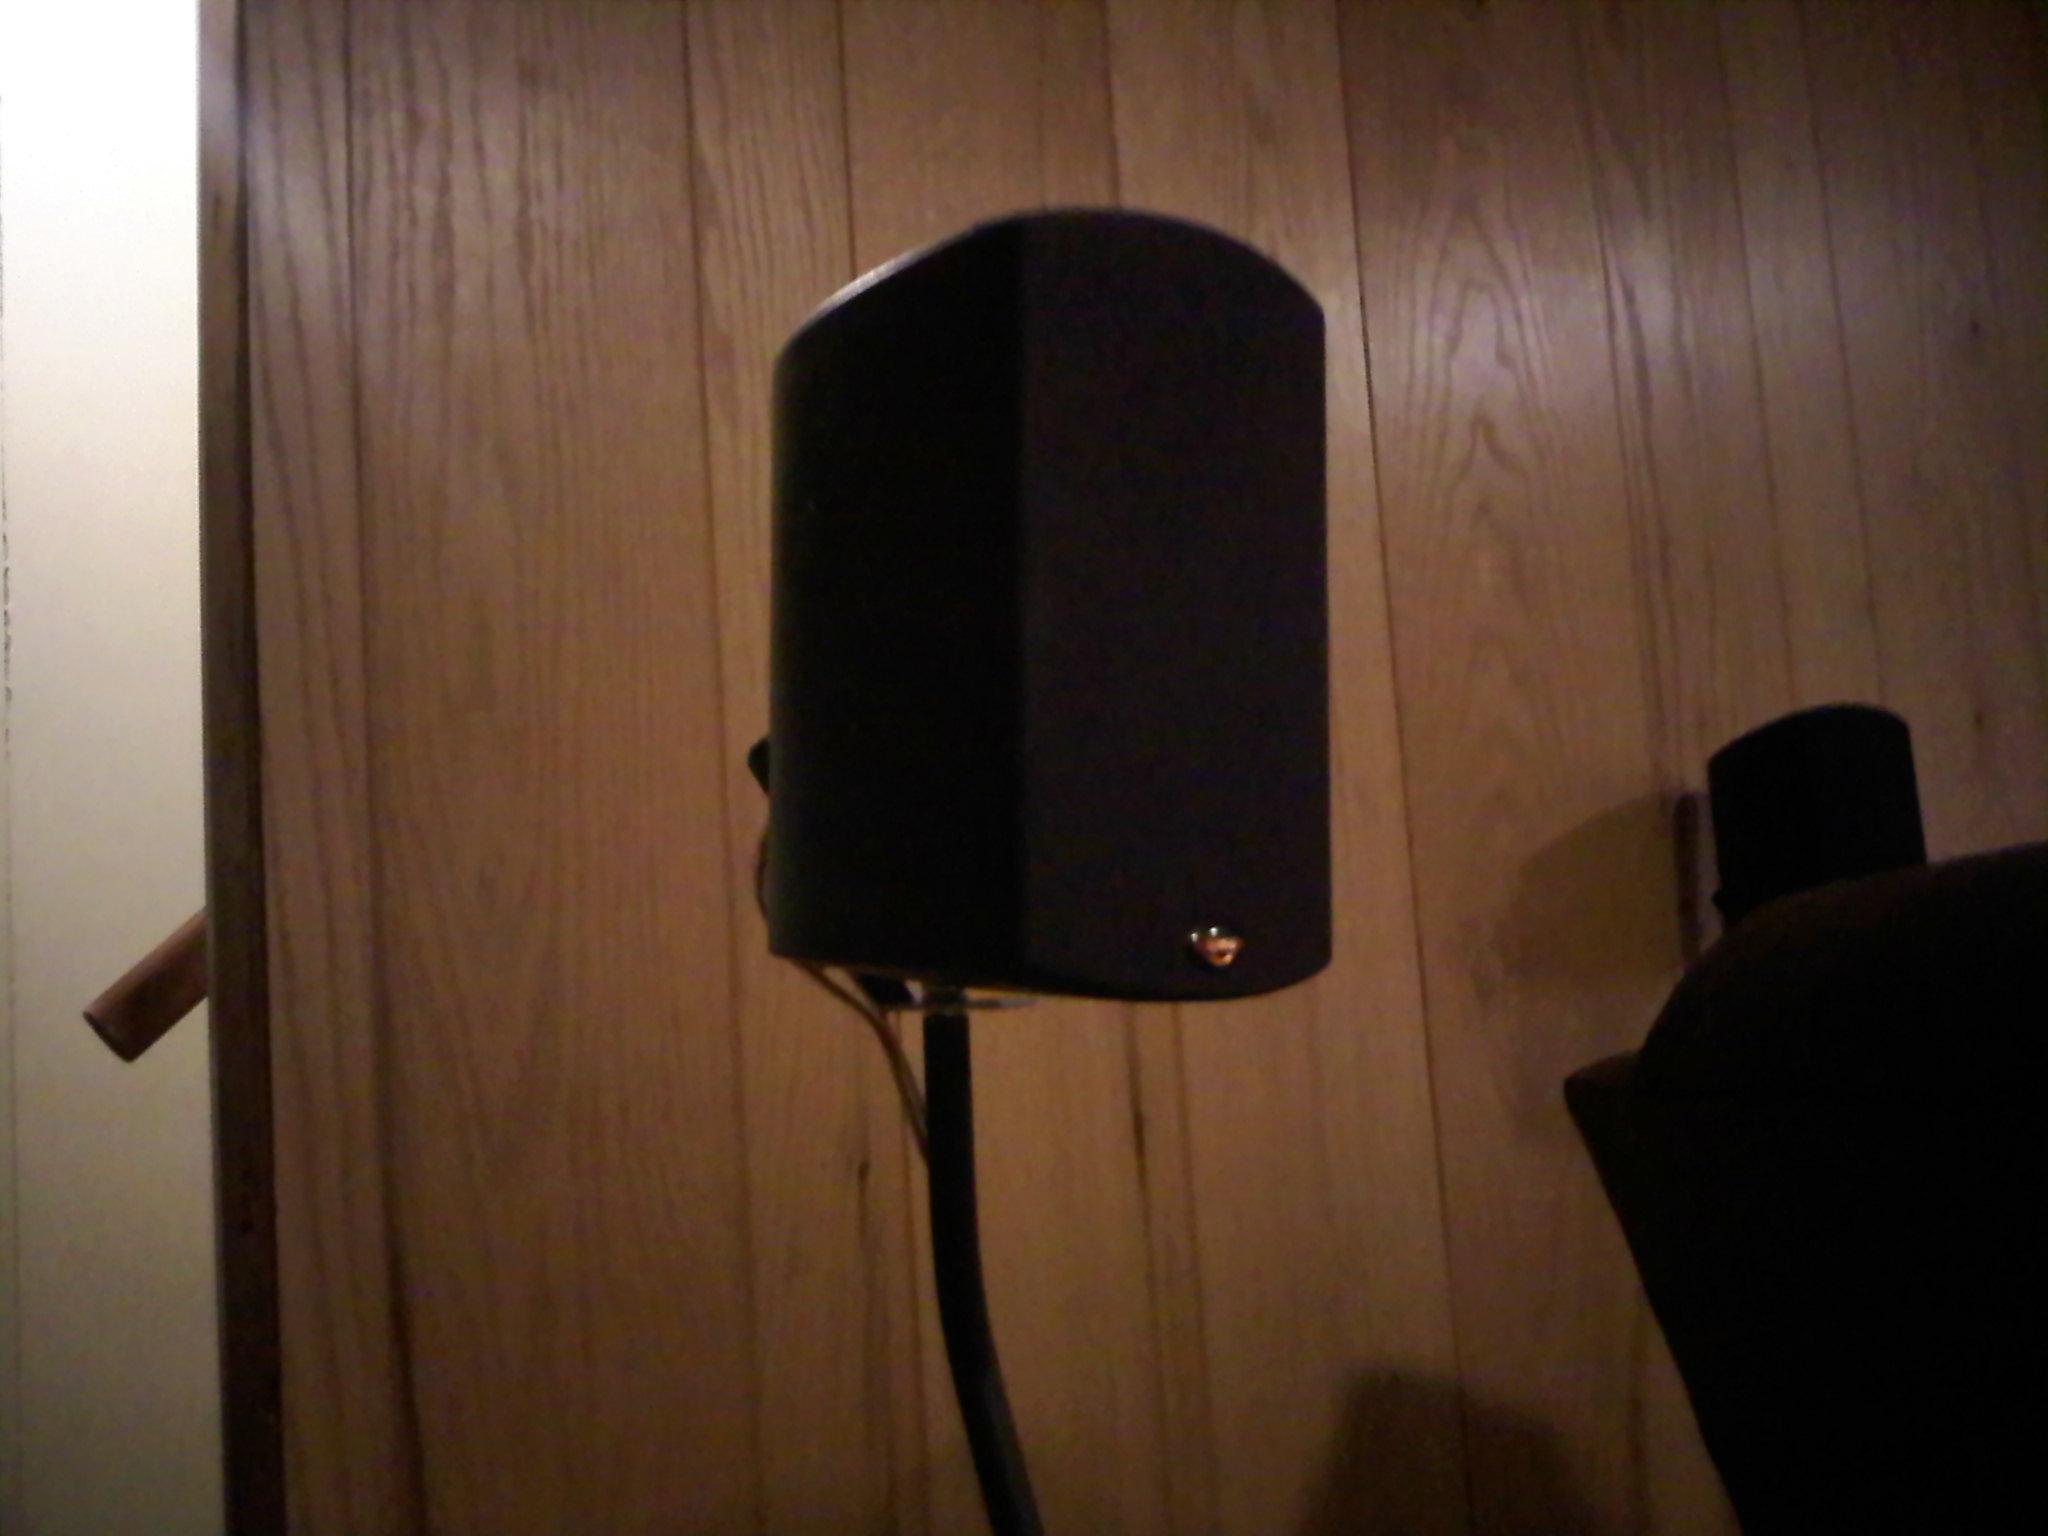 Speaker Stands For Klipsch Speakers Bing Images